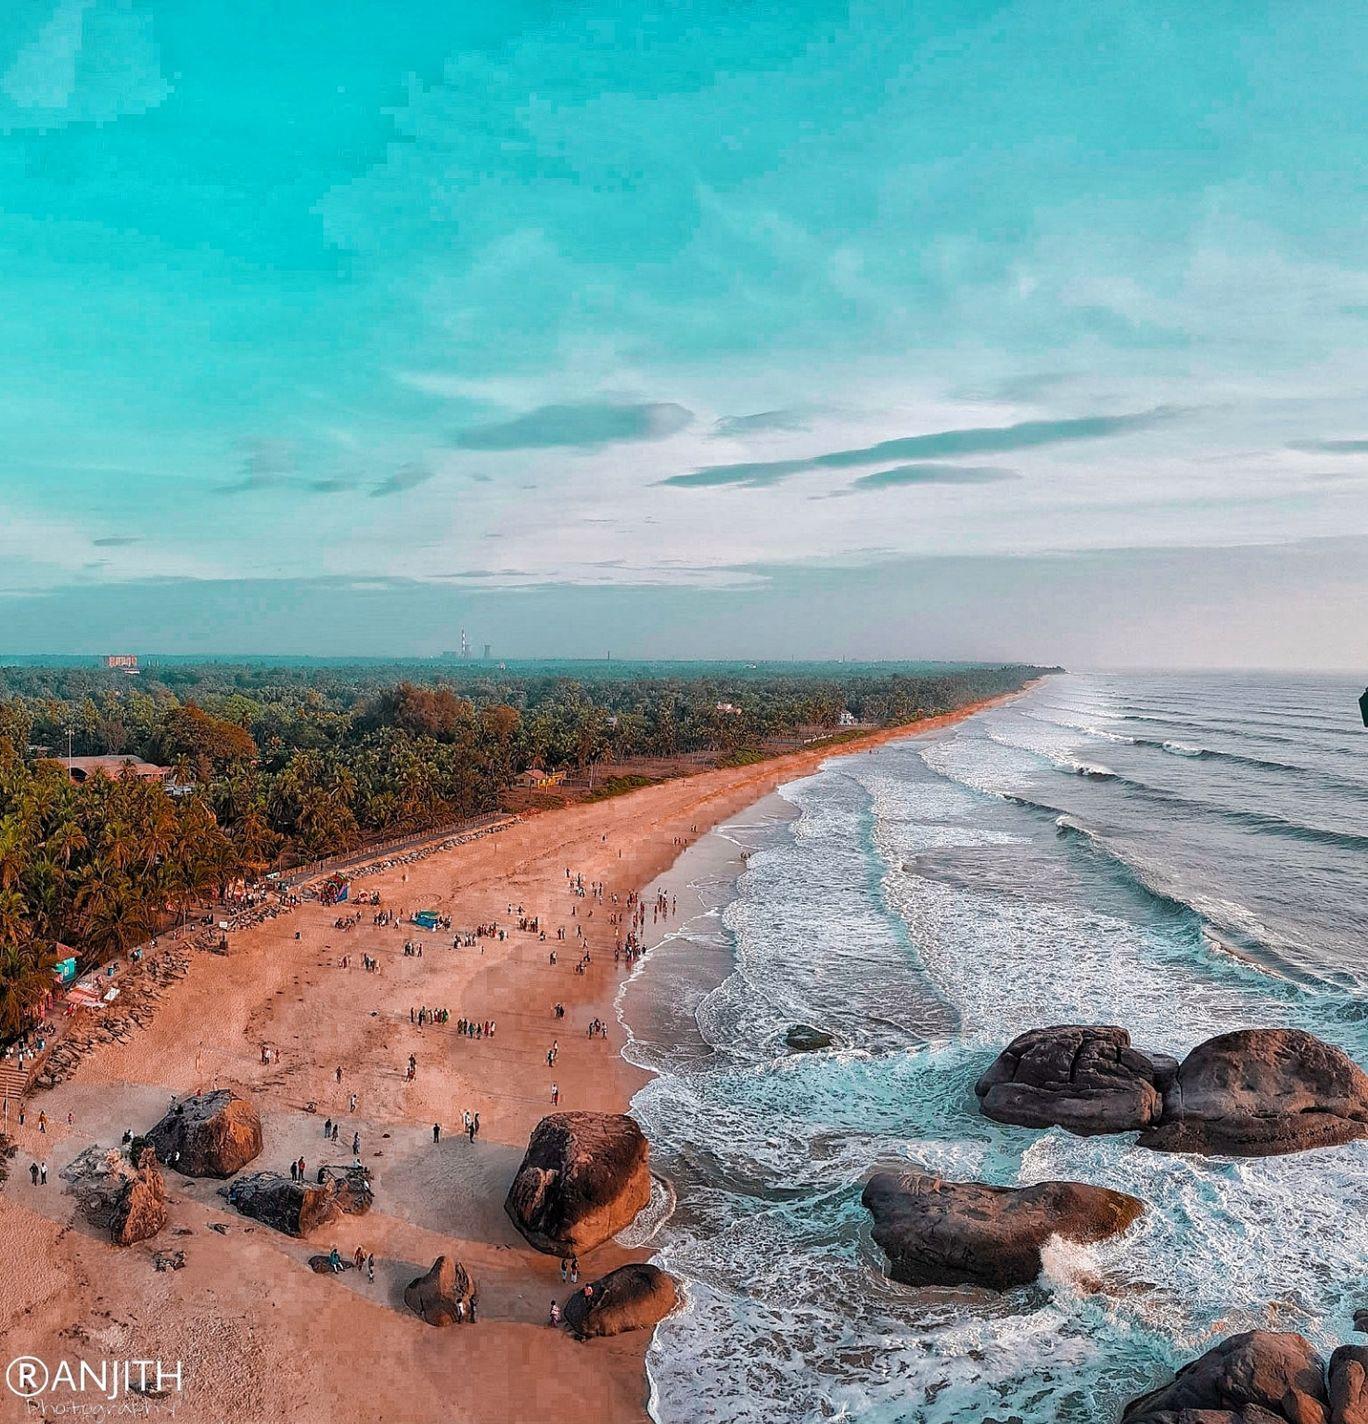 Photo of Kaup By Ranjith Malugodu